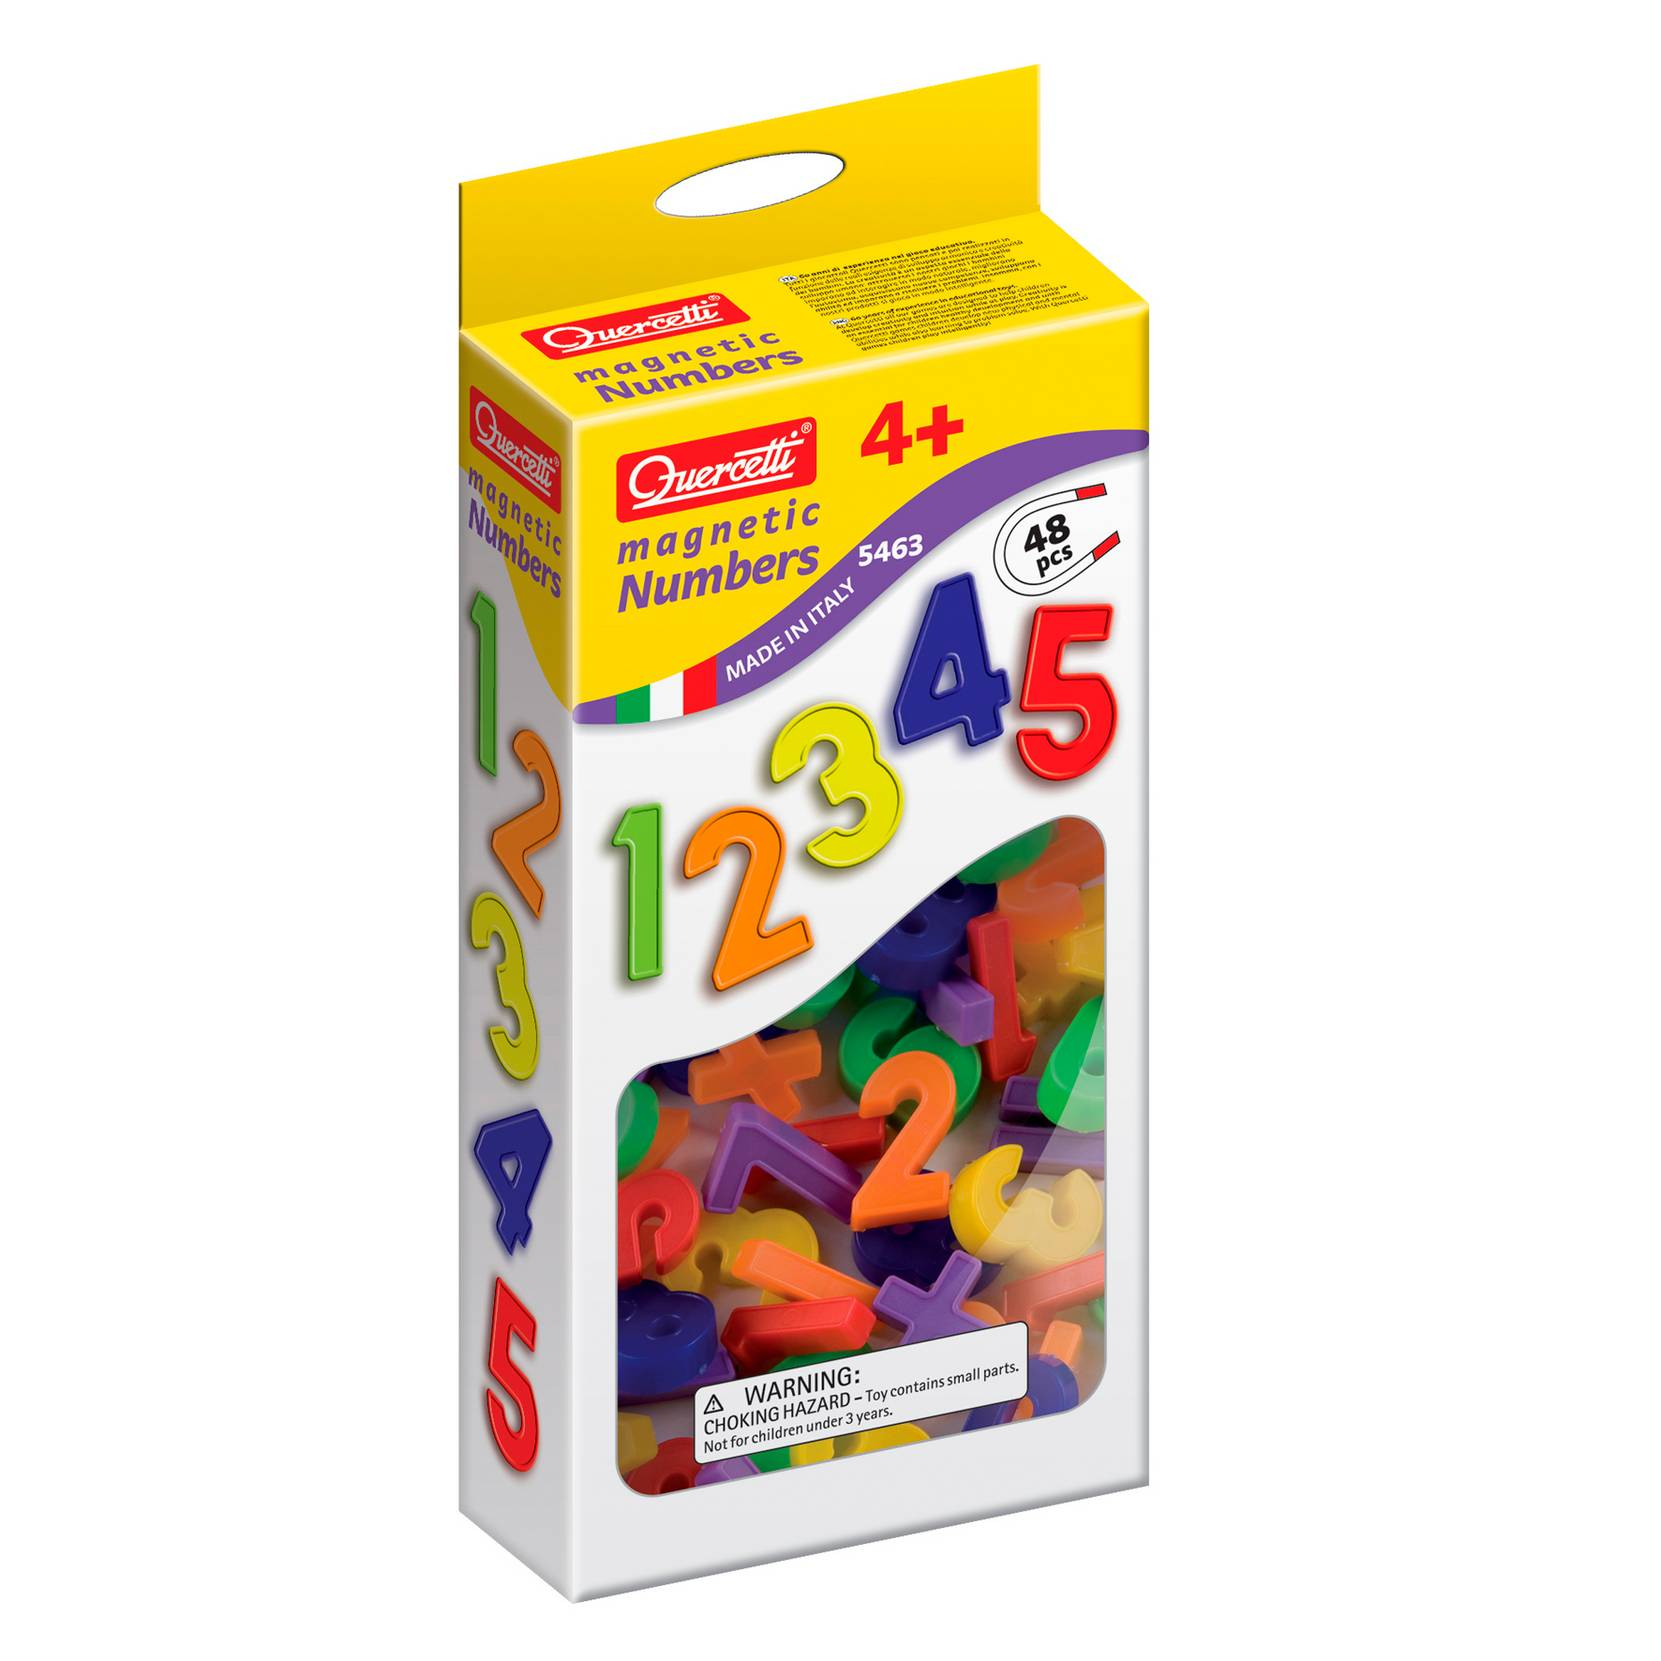 Numeromagneetit, 48 kpl